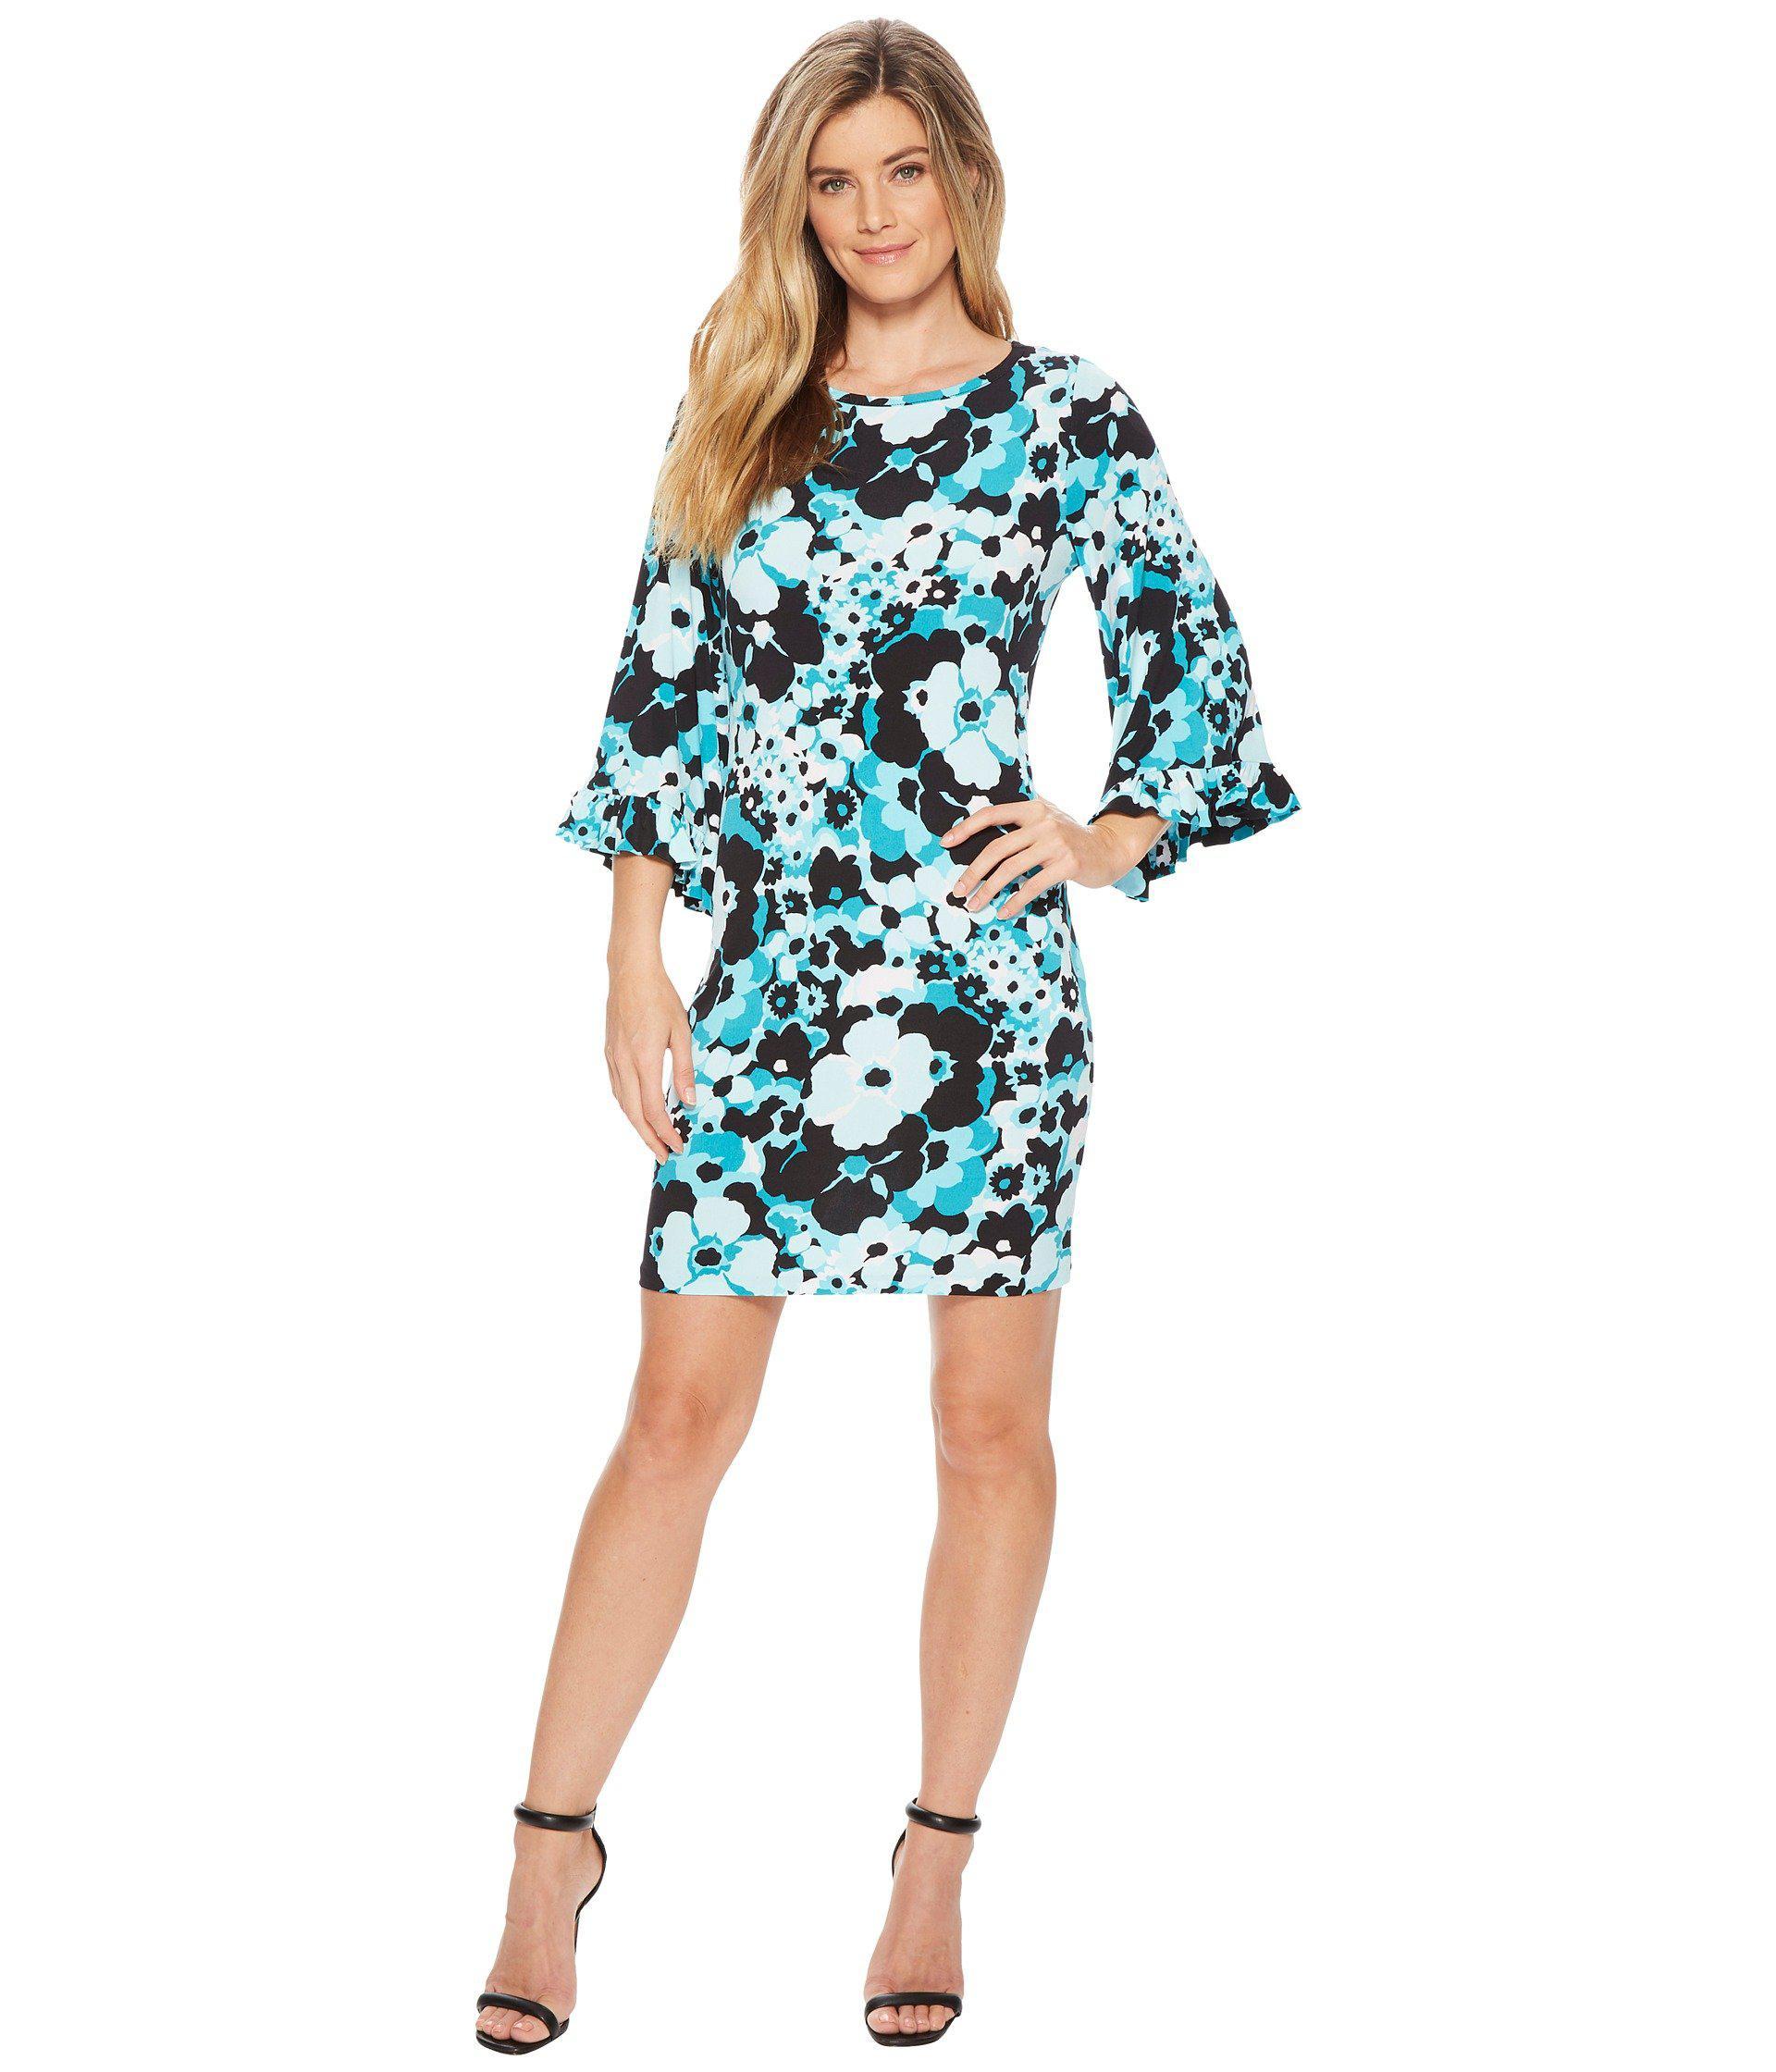 c8dd81dd591a9 Lyst - MICHAEL Michael Kors Springtime Flare Sleeve Dress in Blue ...